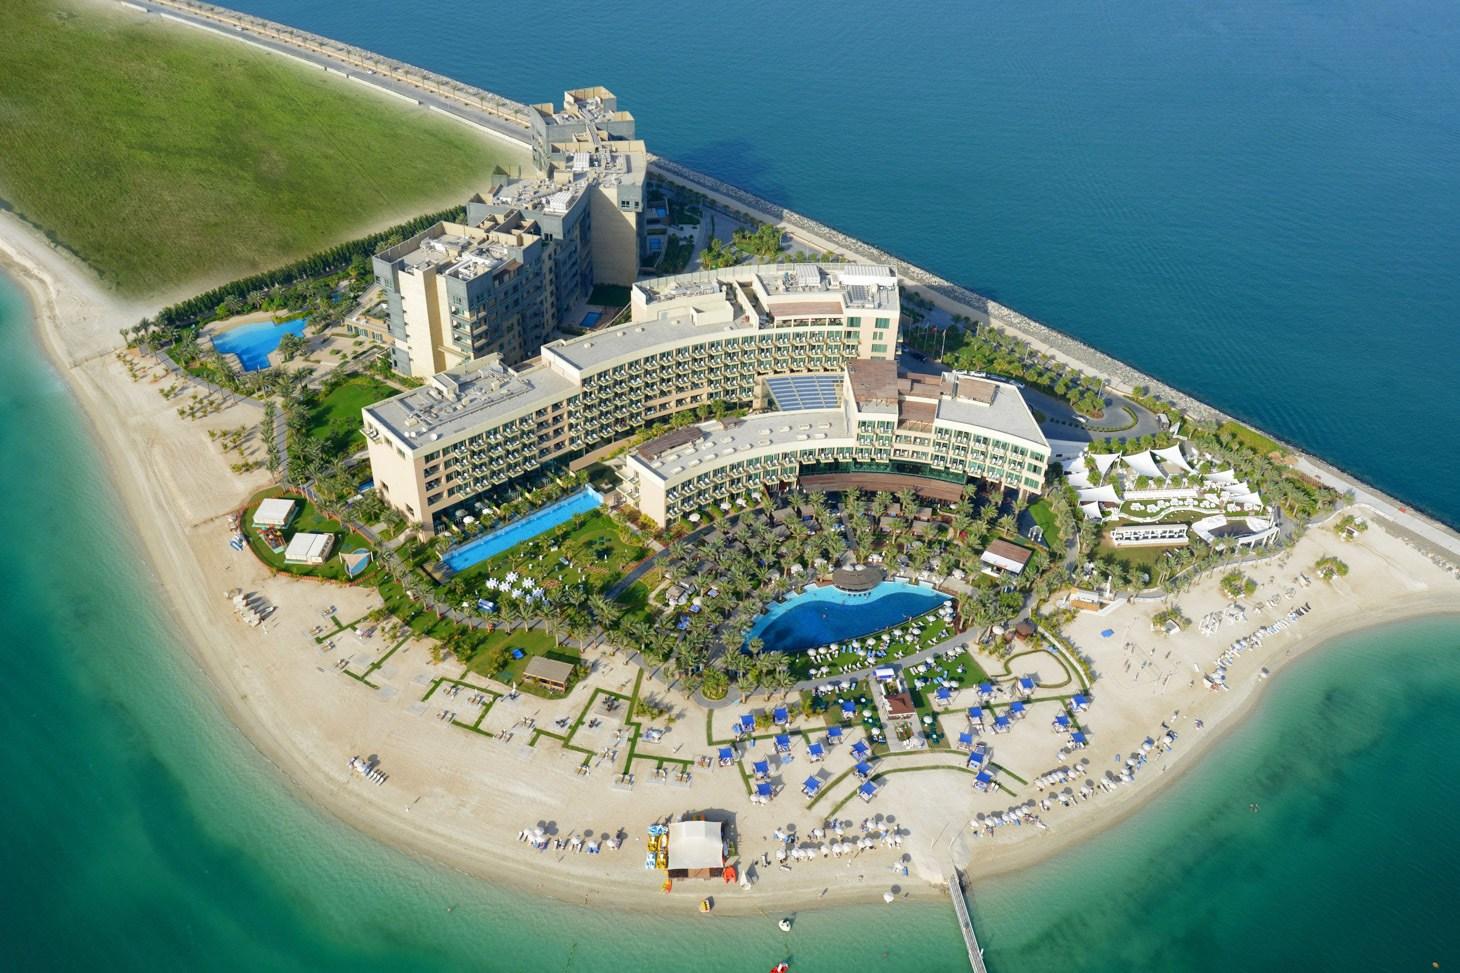 Palm Islands, Dubai - The Eighth Wonder of the World  |Palm Island Dubai From Burj Hotel